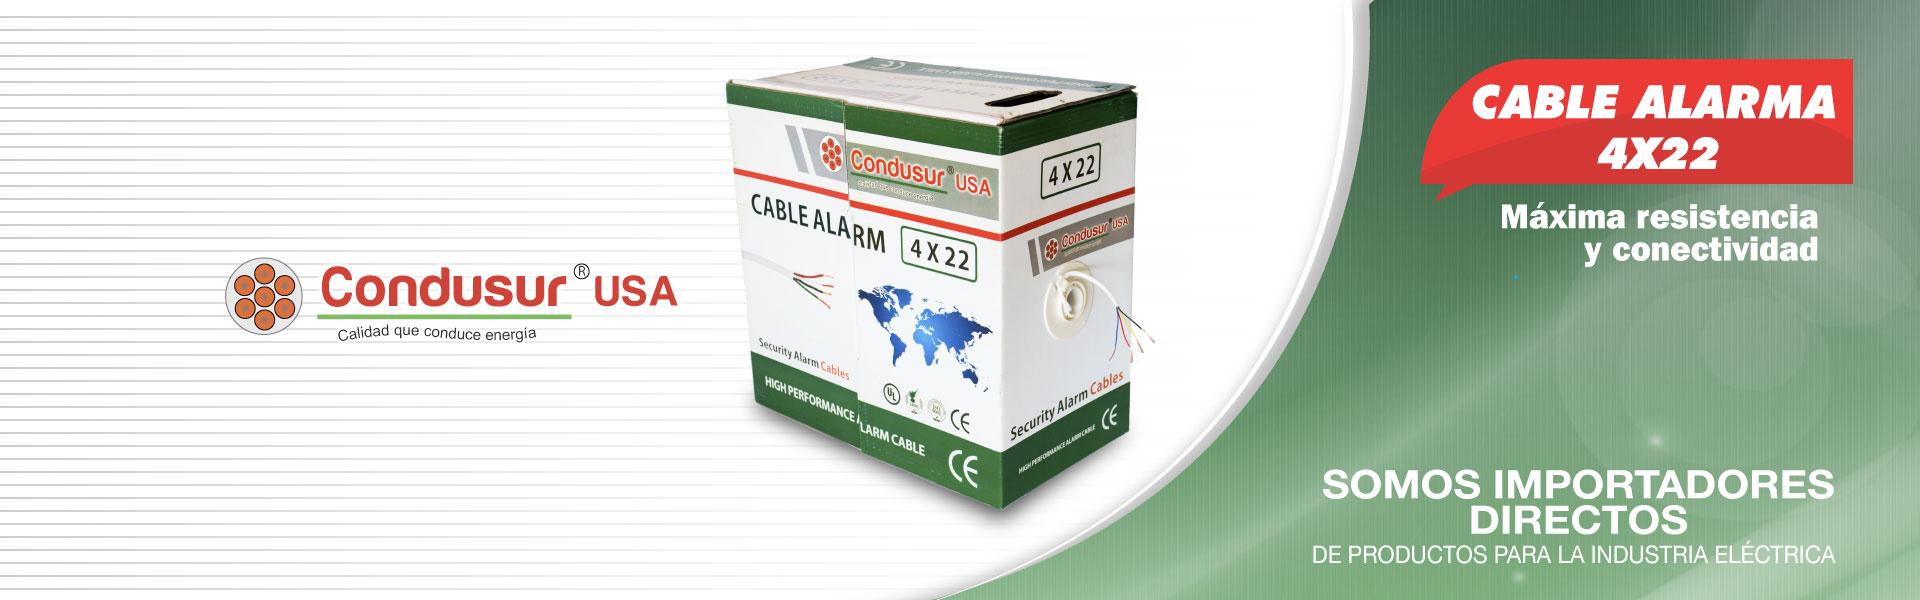 cable-alarma-4x22